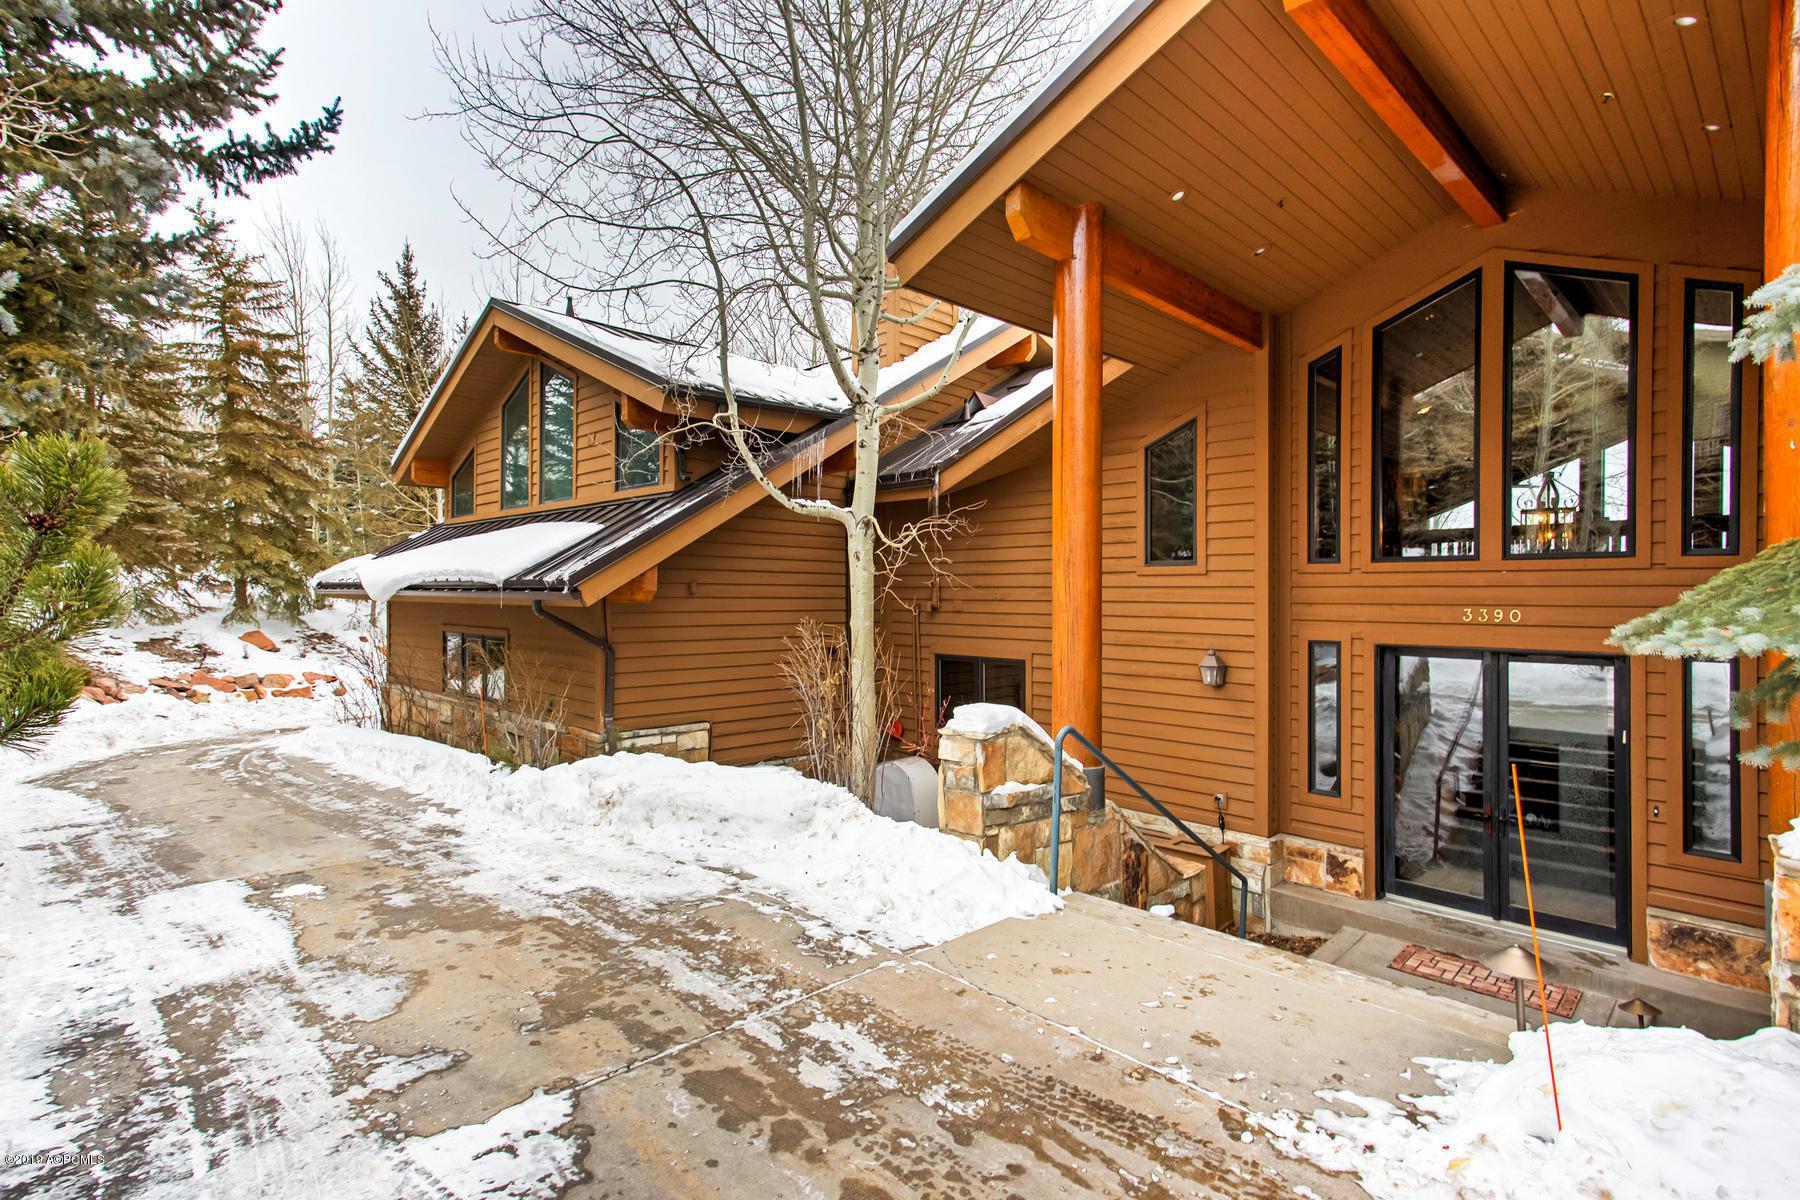 3390 Sun Ridge Drive, Park City, UT 84060 (MLS #11800251) :: Lawson Real Estate Team - Engel & Völkers